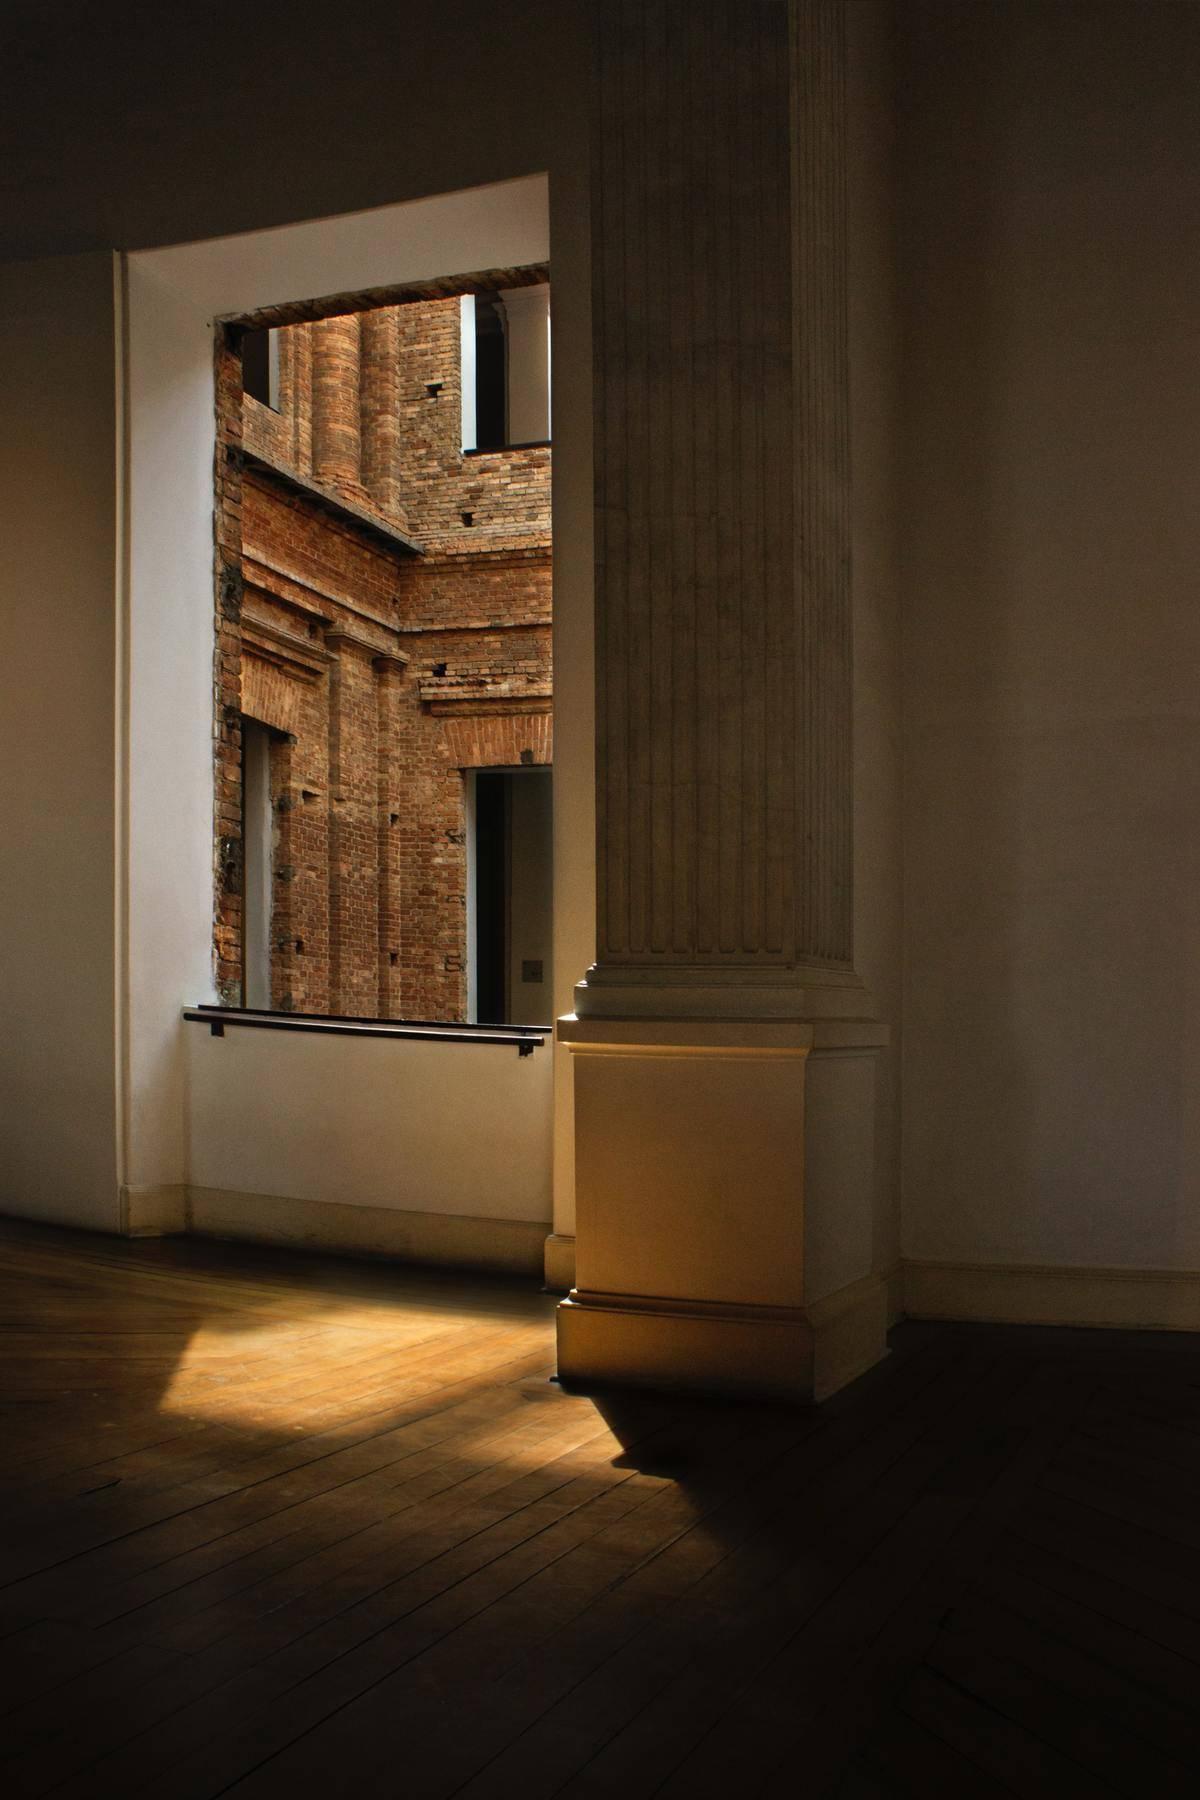 Empty apartment in low lighting